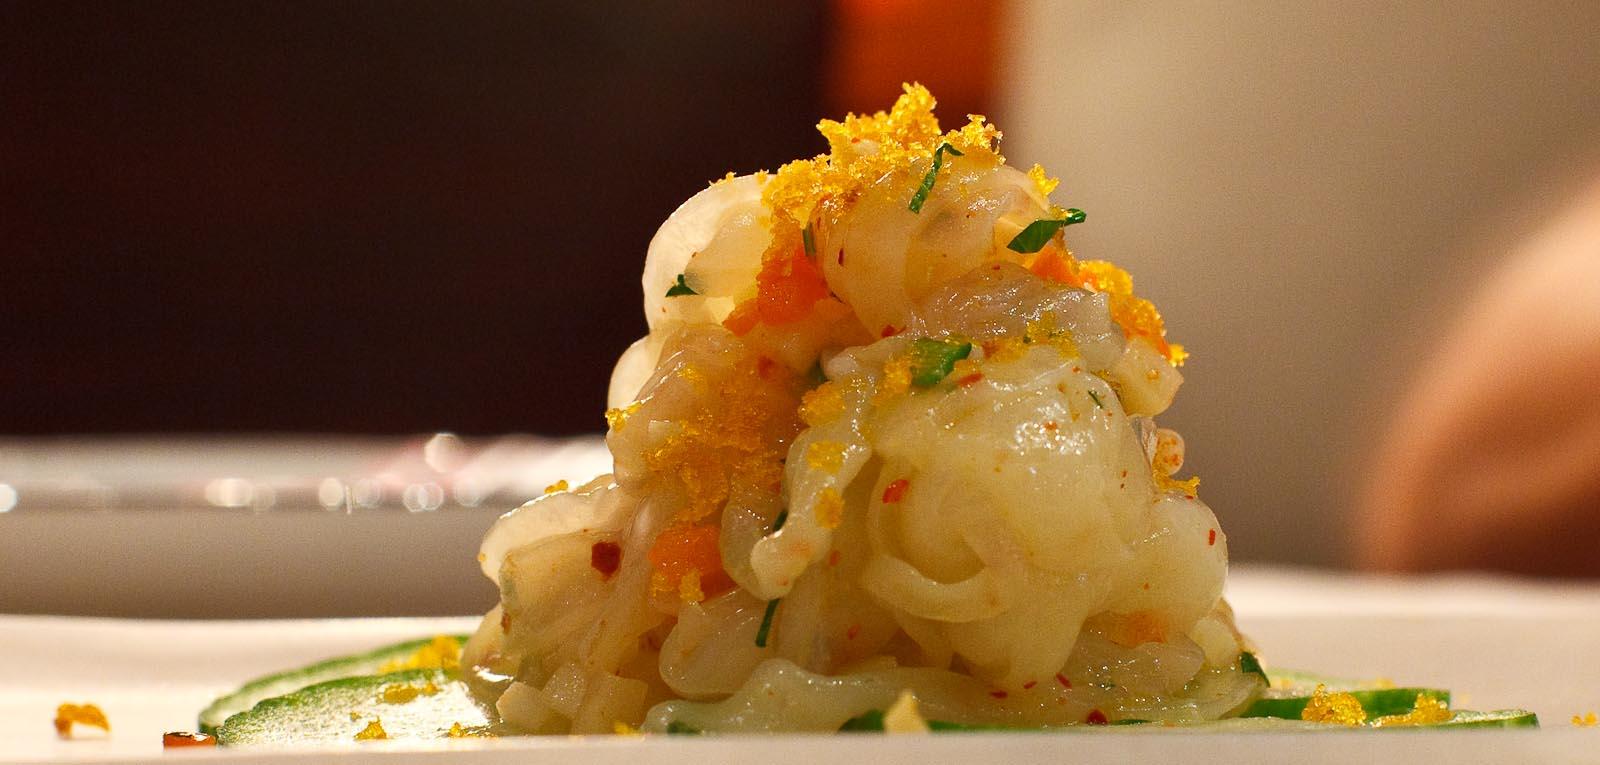 Marea - SEPPIA - cuttlefish tagliatelle, soffrito crudo, bottarga di muggine (close up)